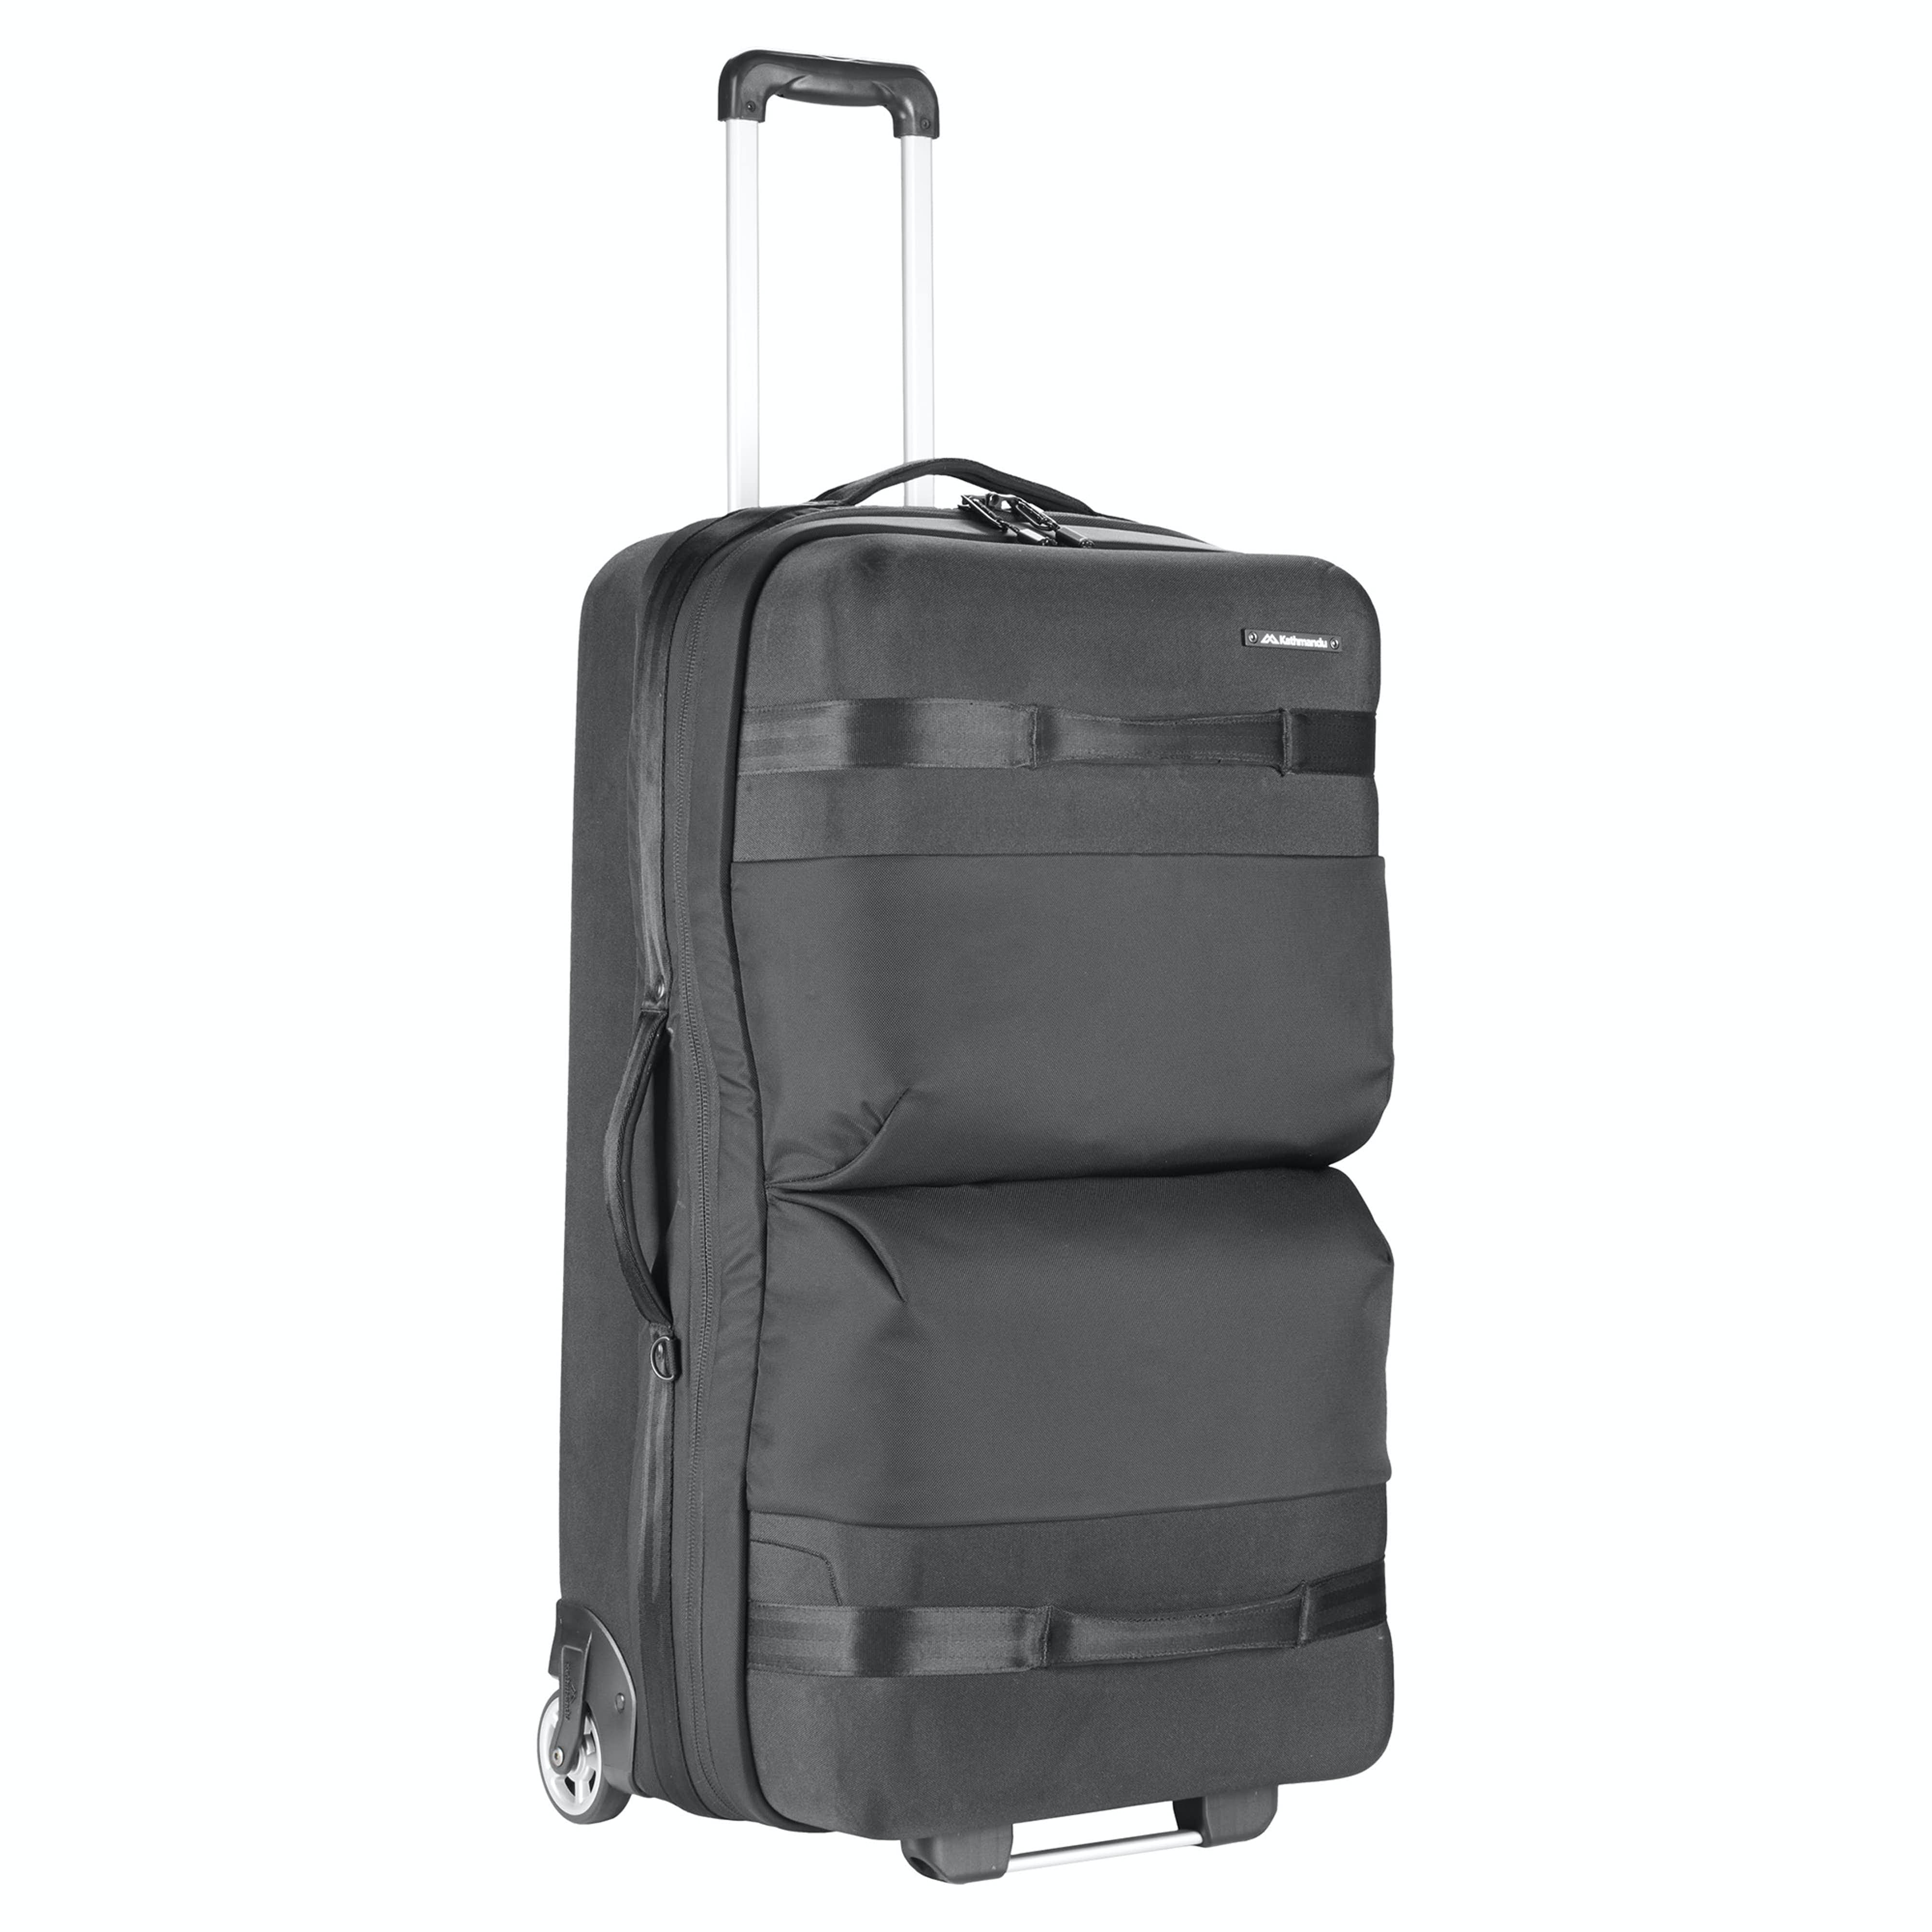 758a877653 Jet 80L Hard Shell Wheeled Luggage Trolley